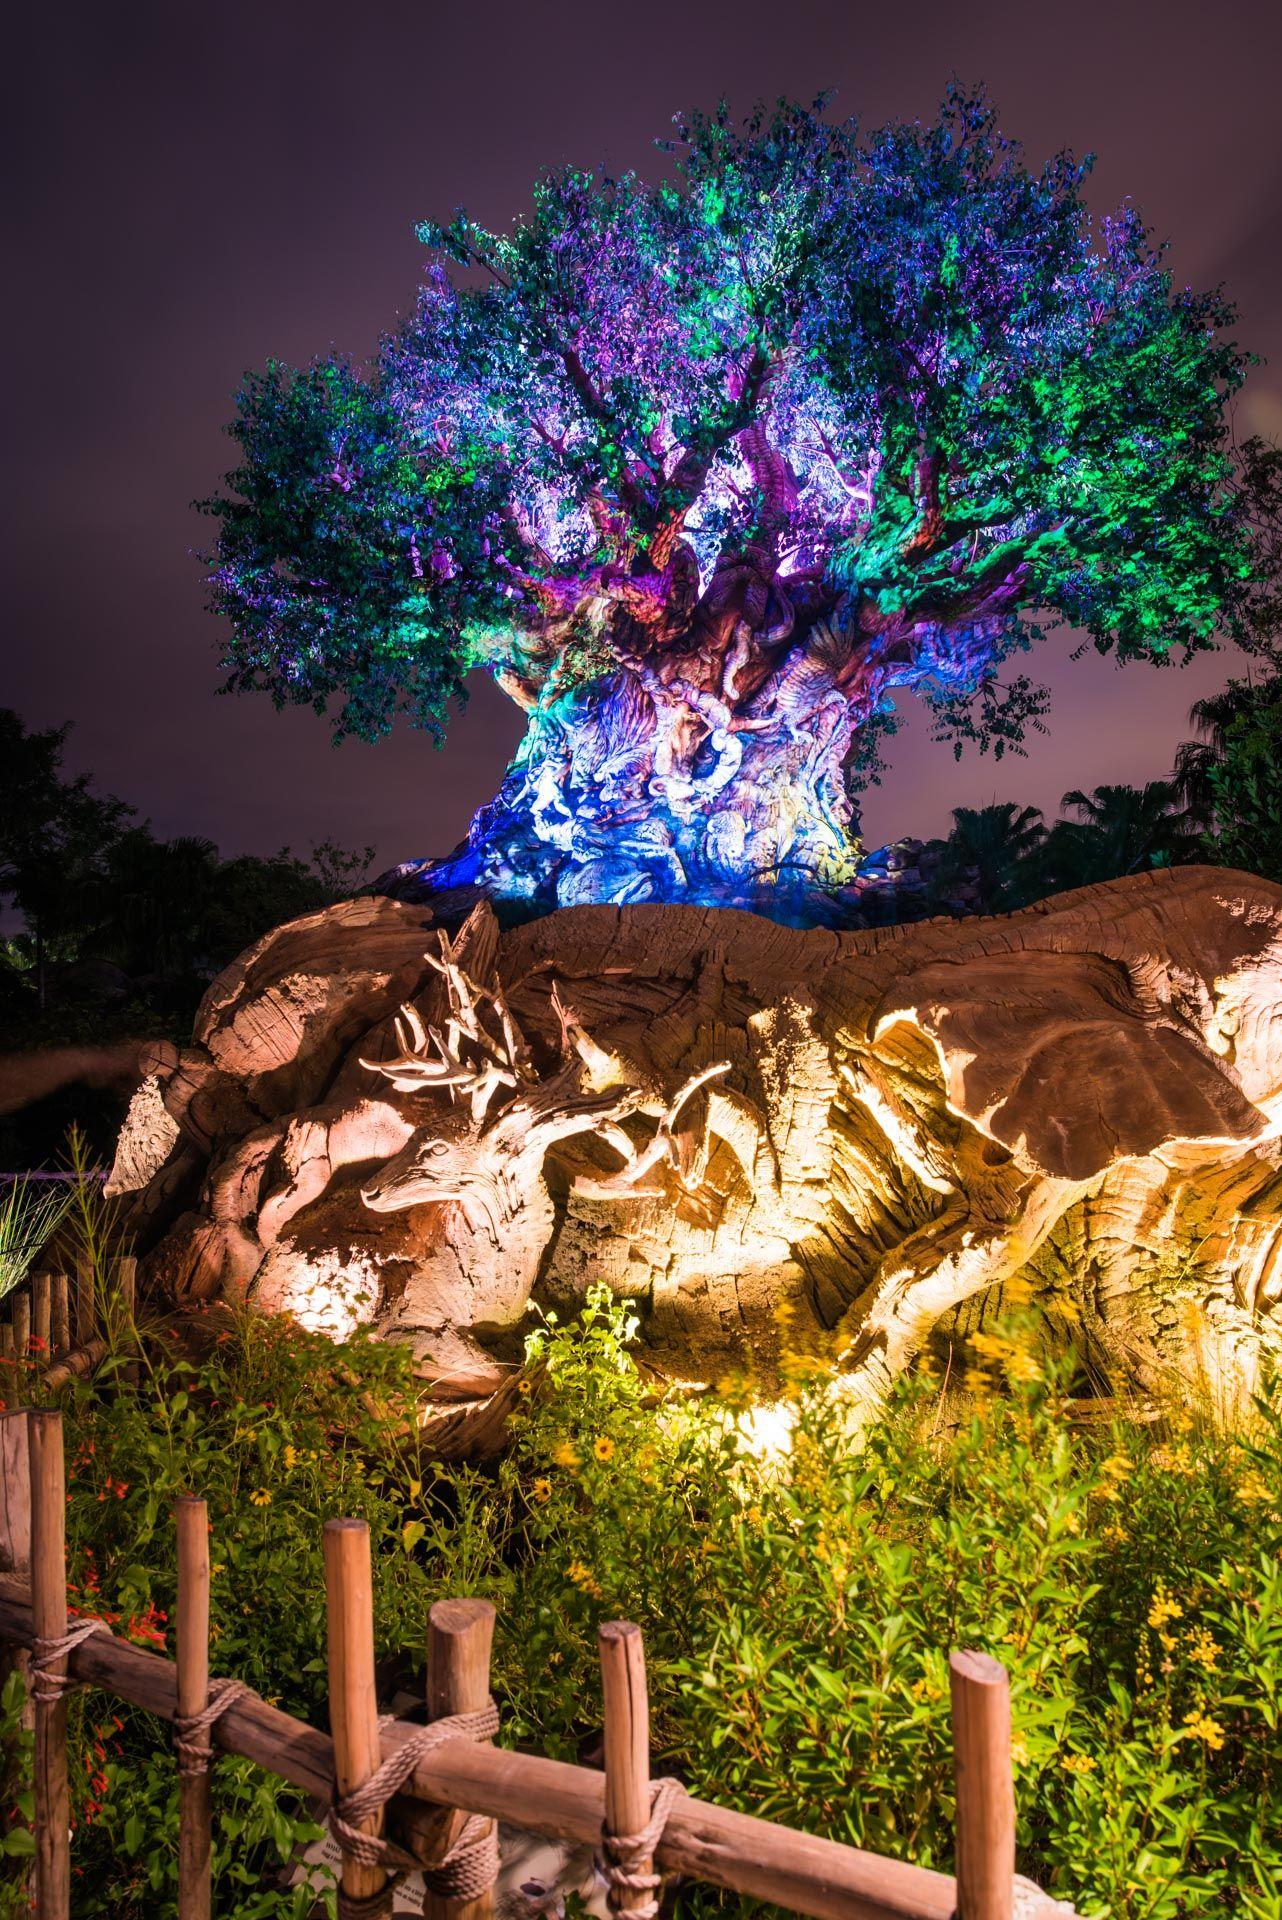 1 Day Itinerary For Walt Disney World's Animal Kingdom Park - The Bucket List Narratives